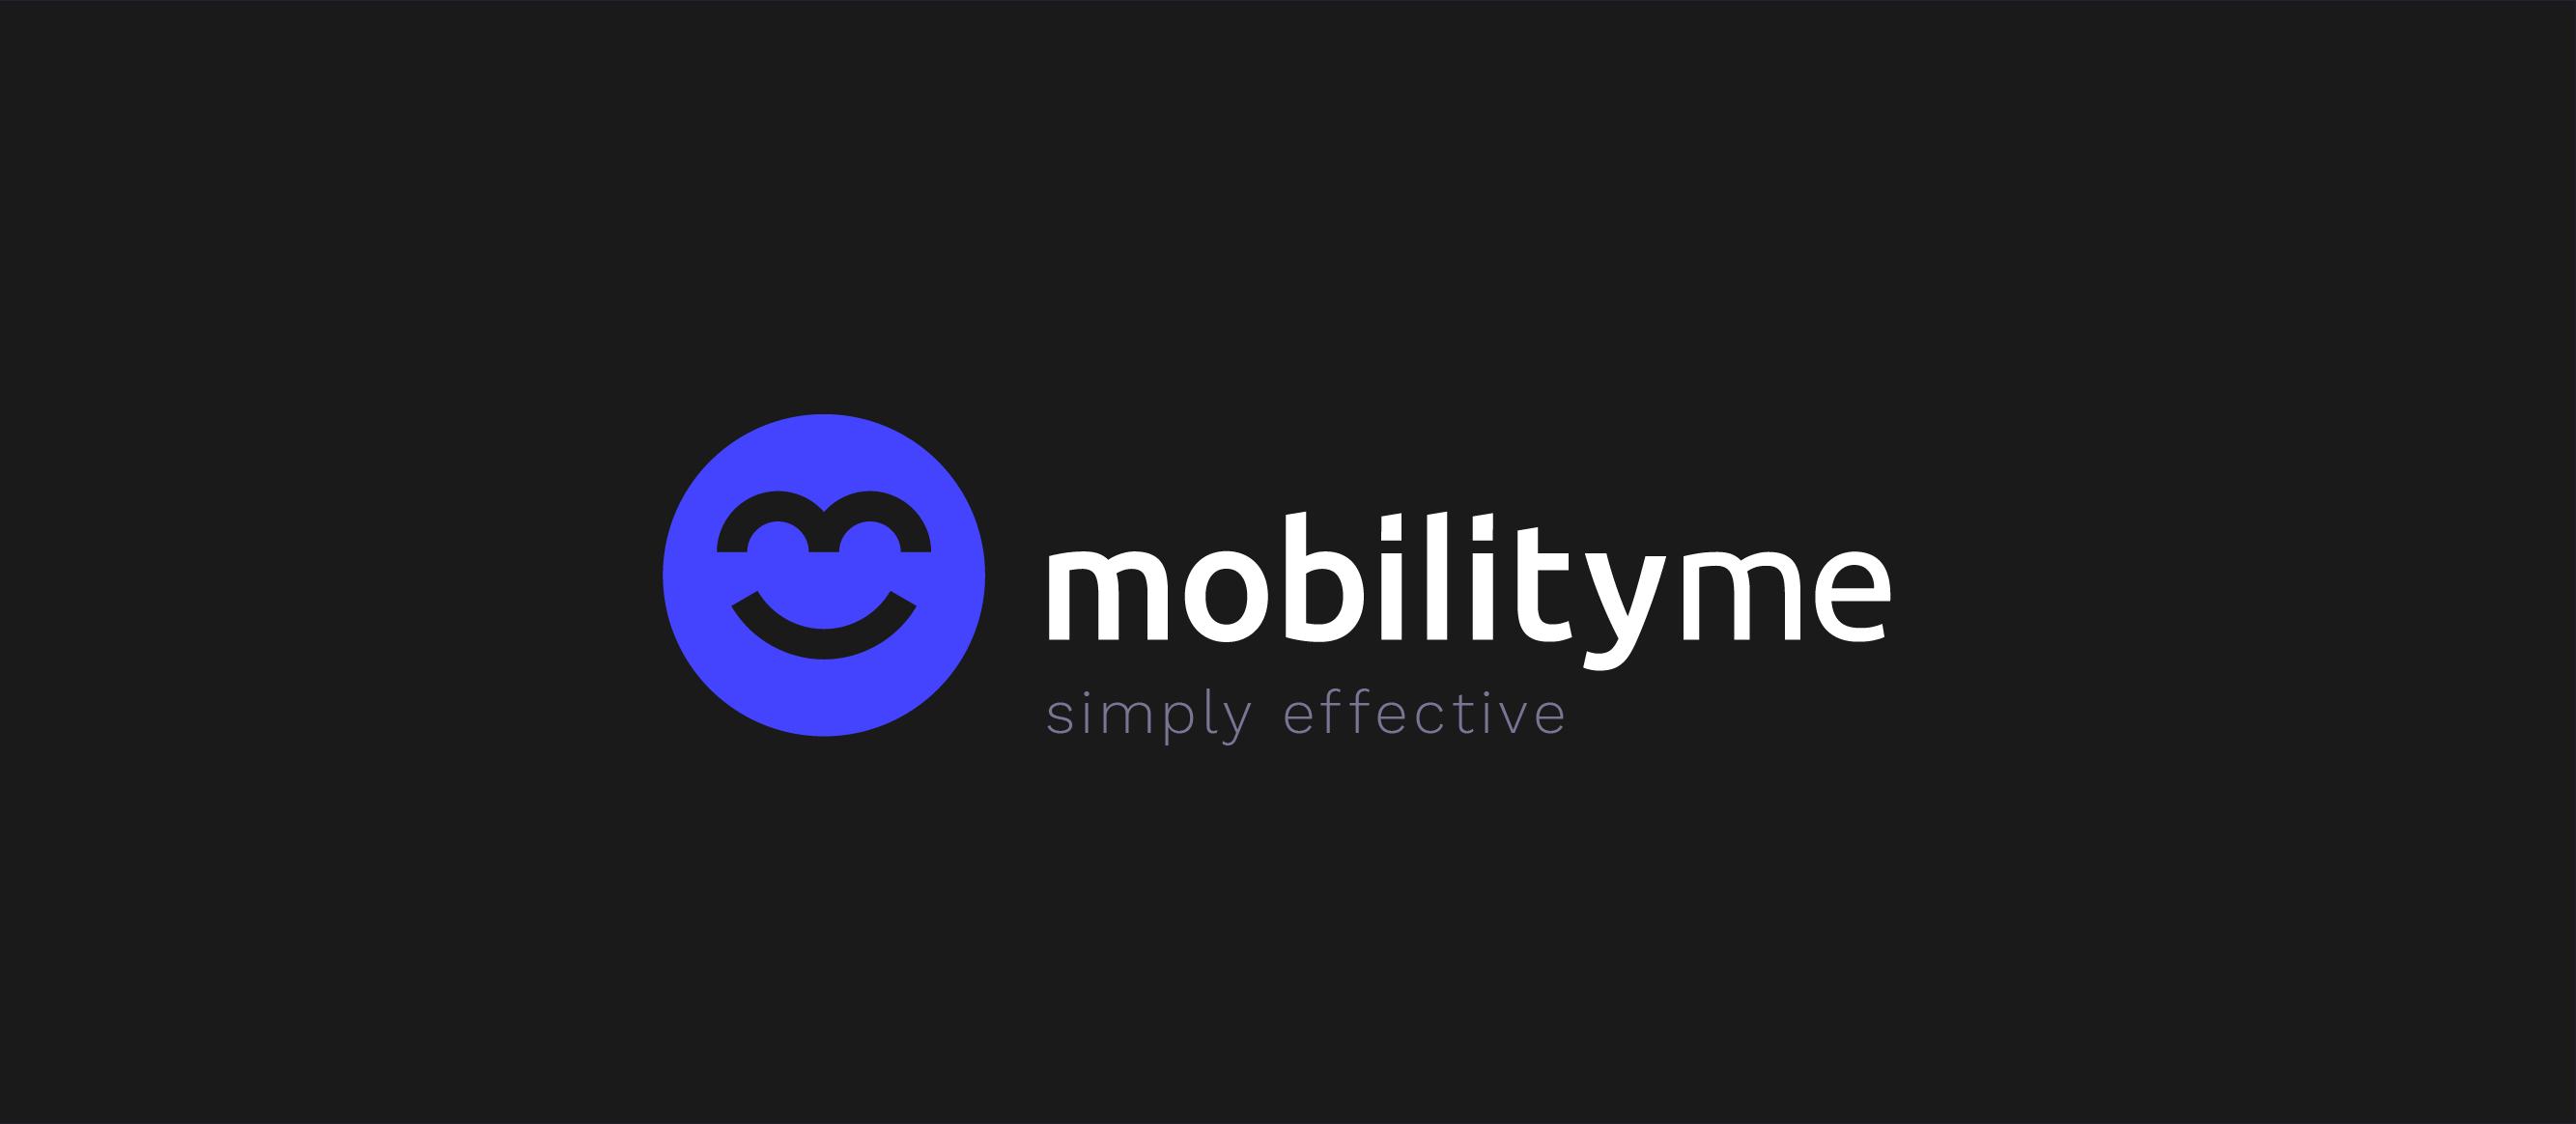 MobilityMe-Tagline-07